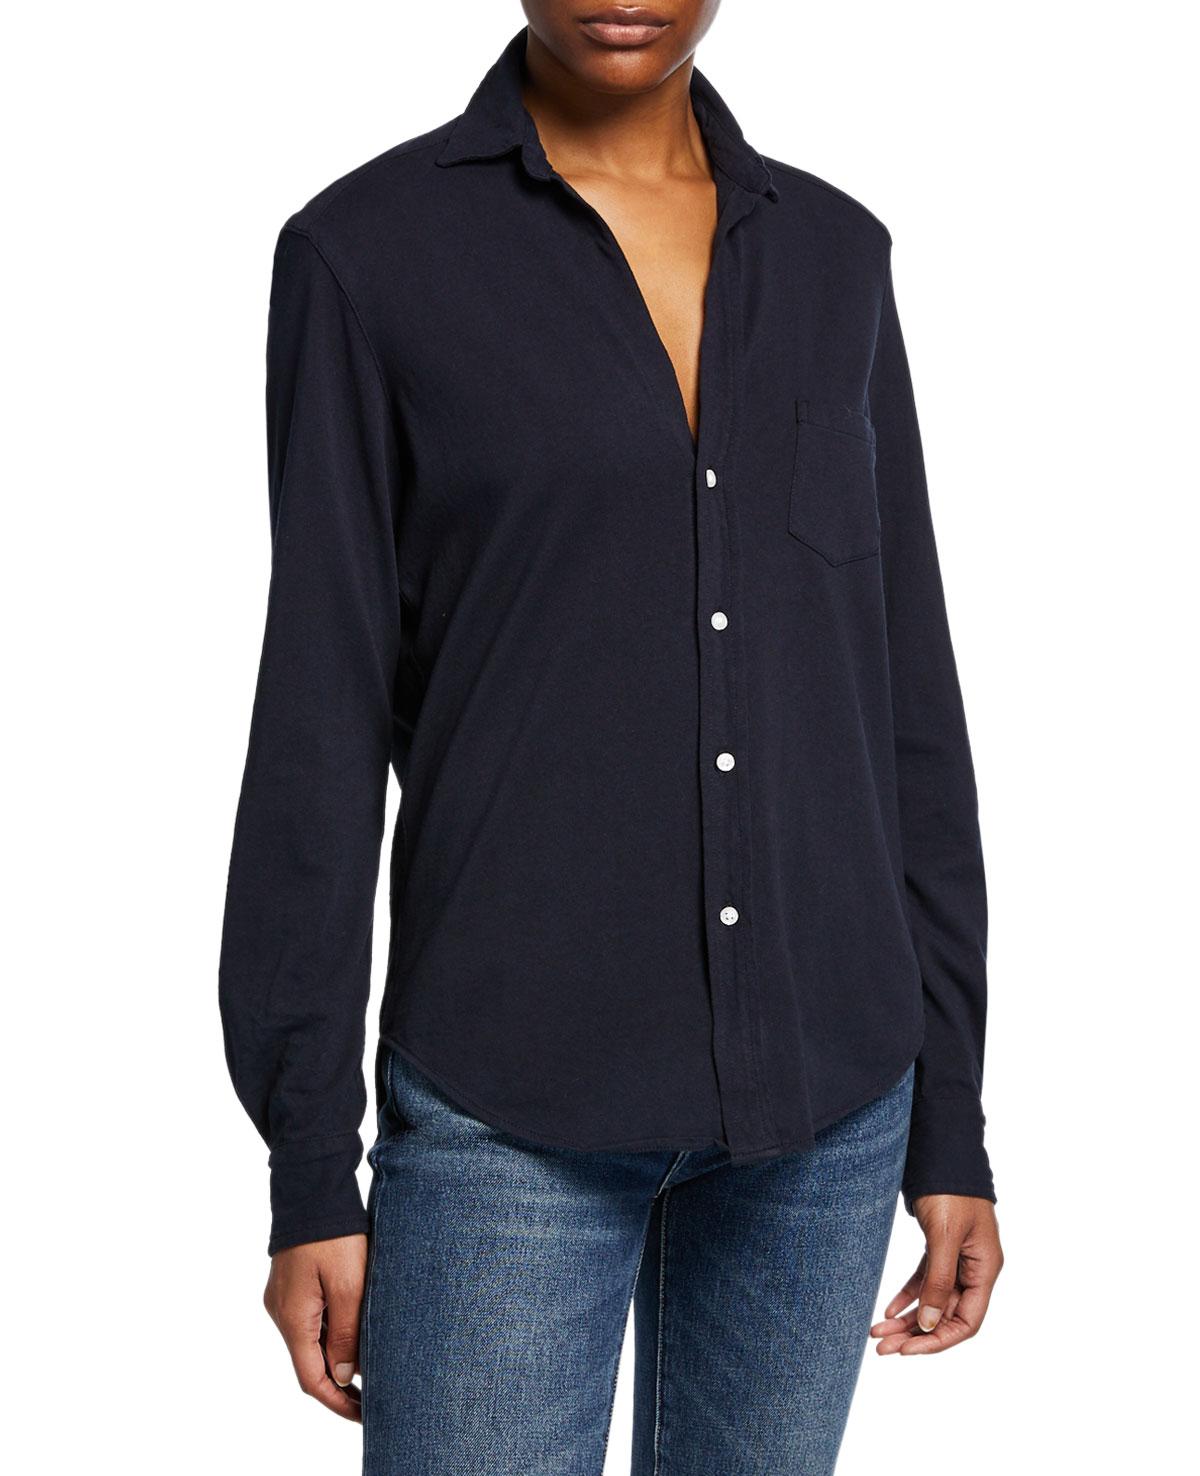 Frank & Eileen Tee Lab Button-Down Long-Sleeve Cotton Shirt